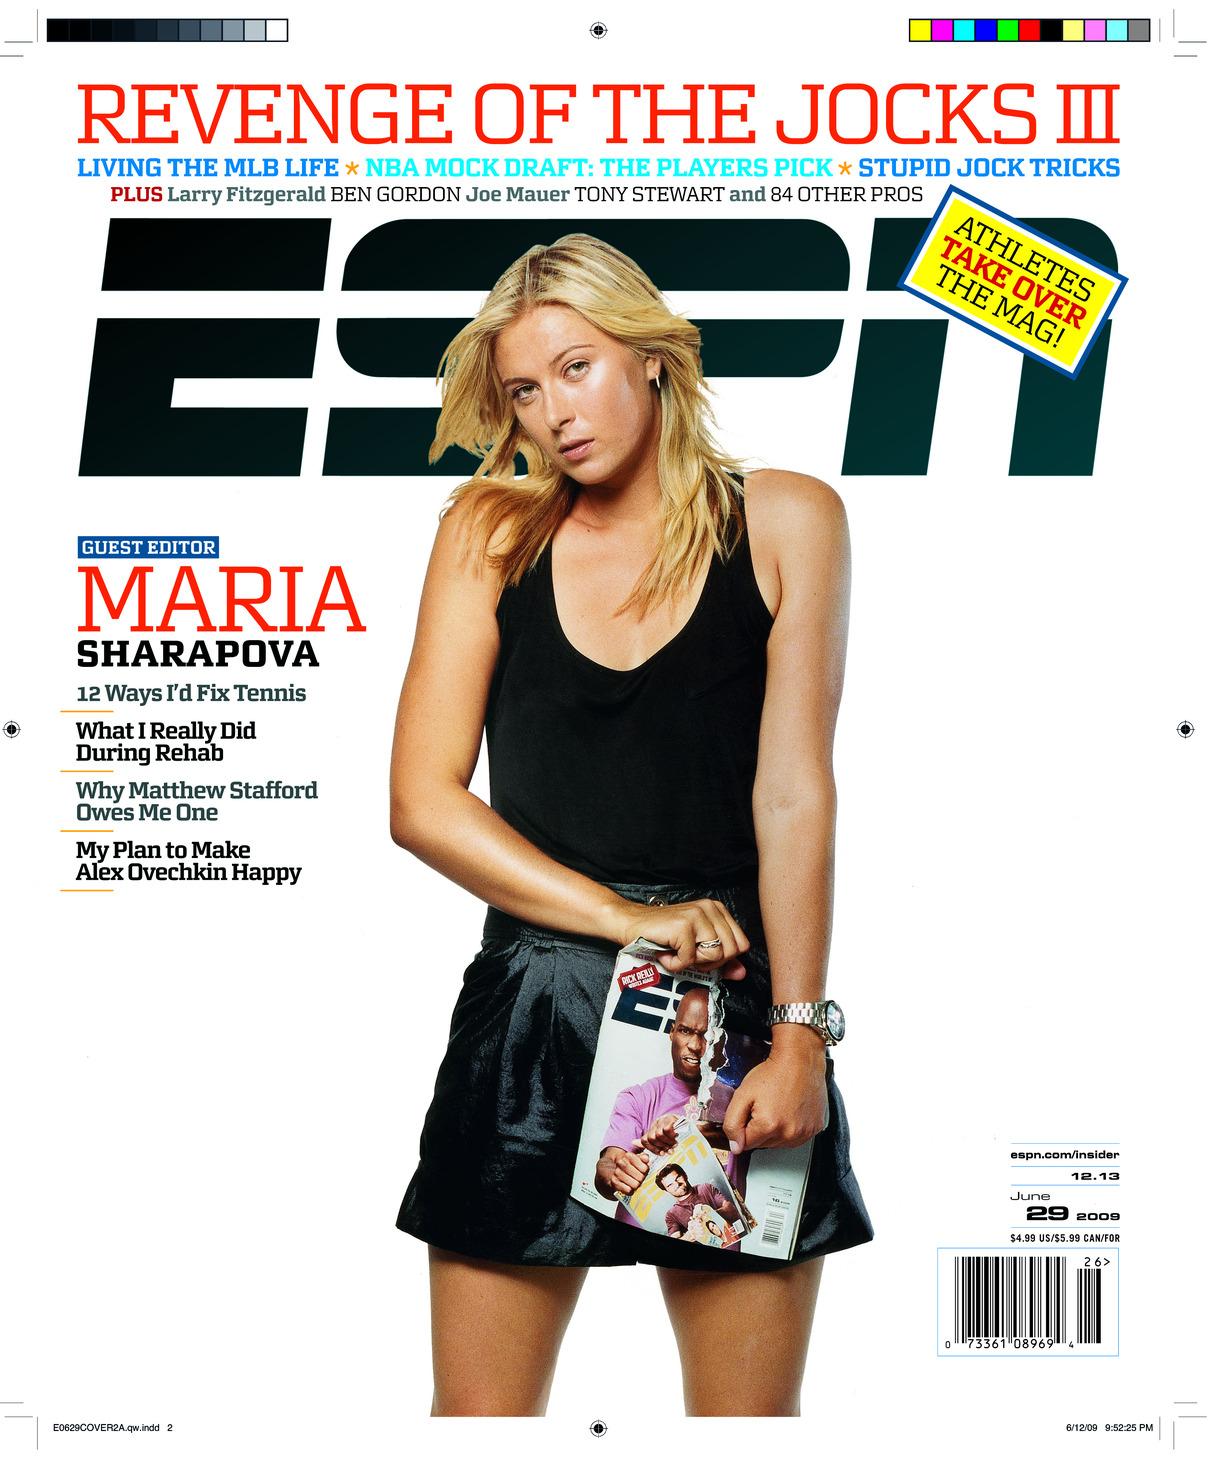 Дизайн обложки лицо издания шарапова